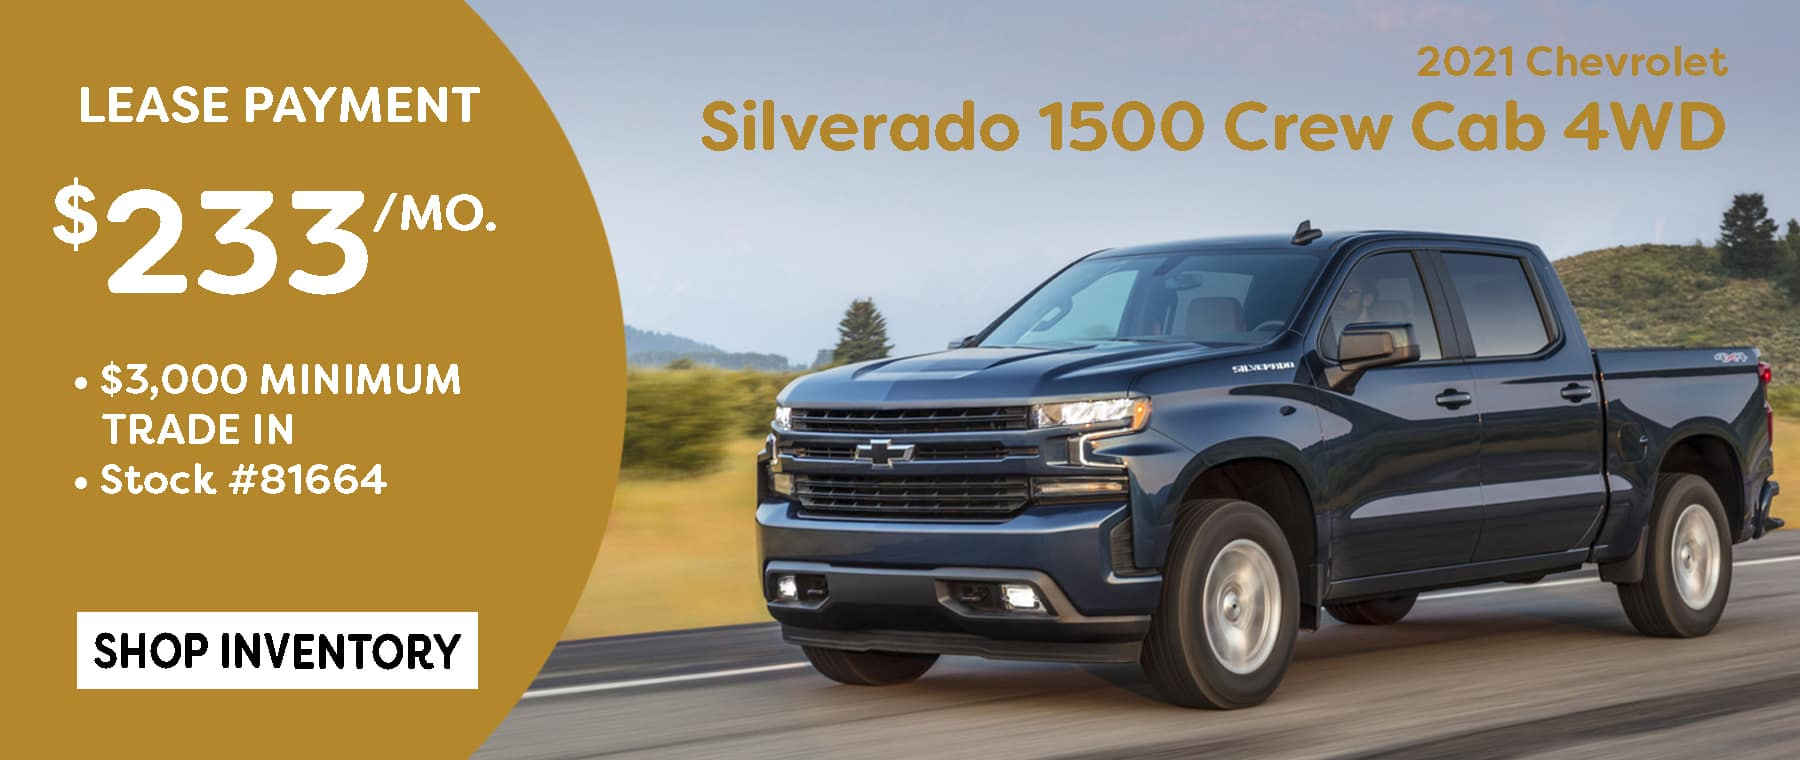 May 2021 Silverado Lease Offer $233/mo*